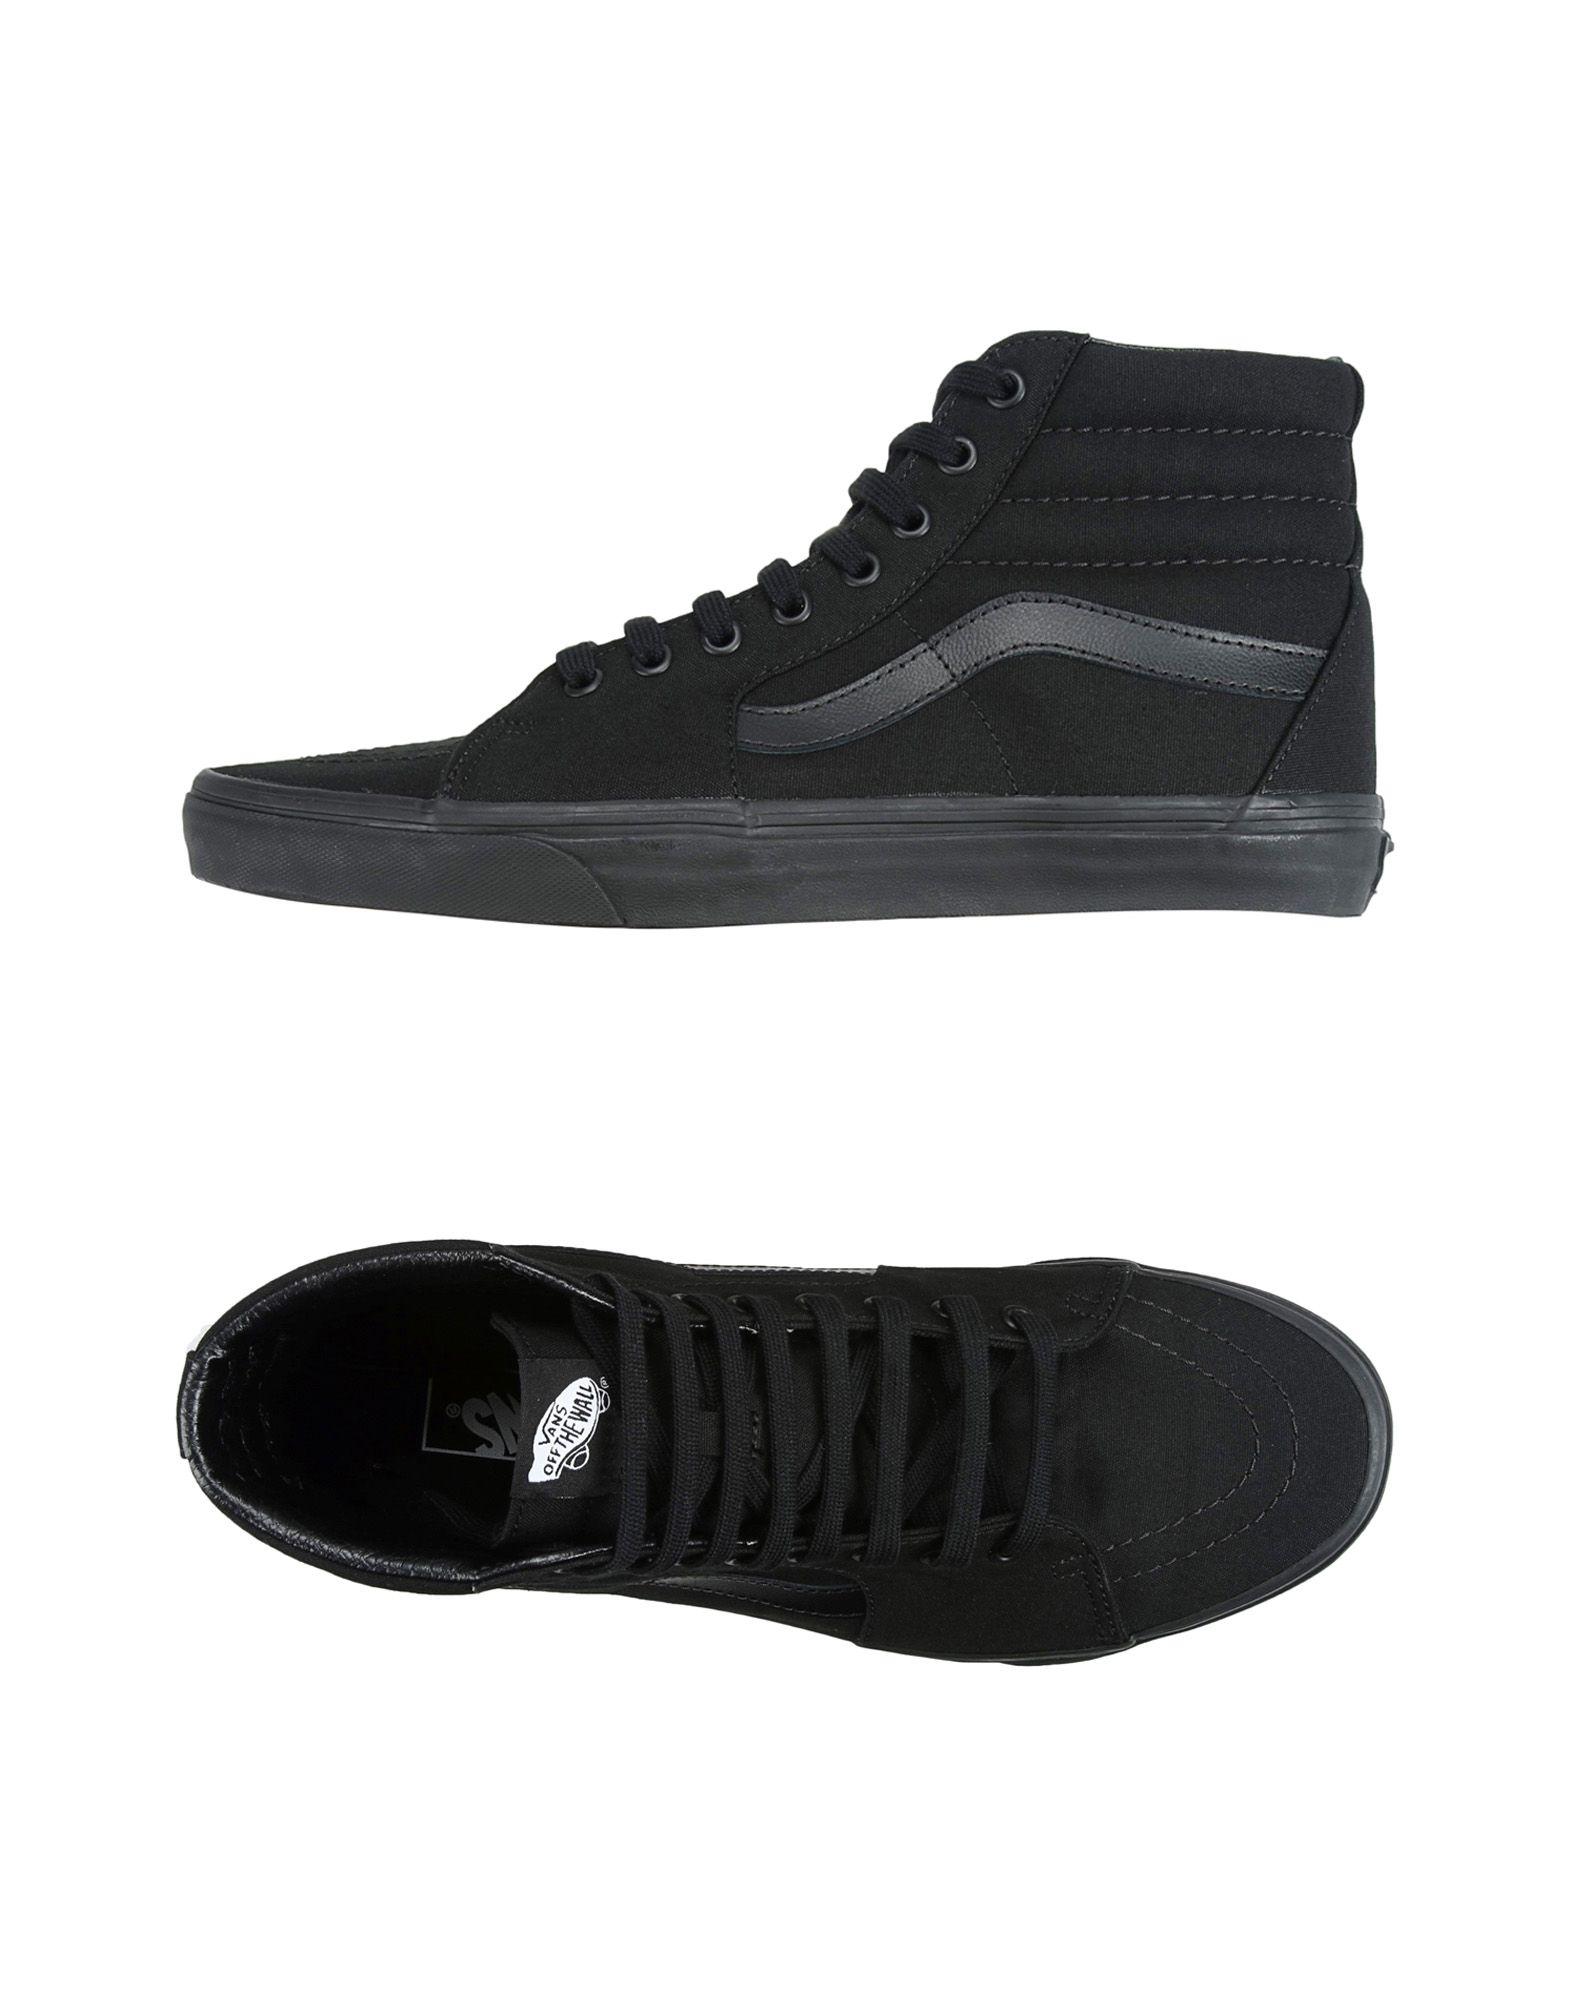 d58e4bb730b635 Vans Ua Sk8-Hi - Sneakers - - - Men Vans Sneakers online on United ...